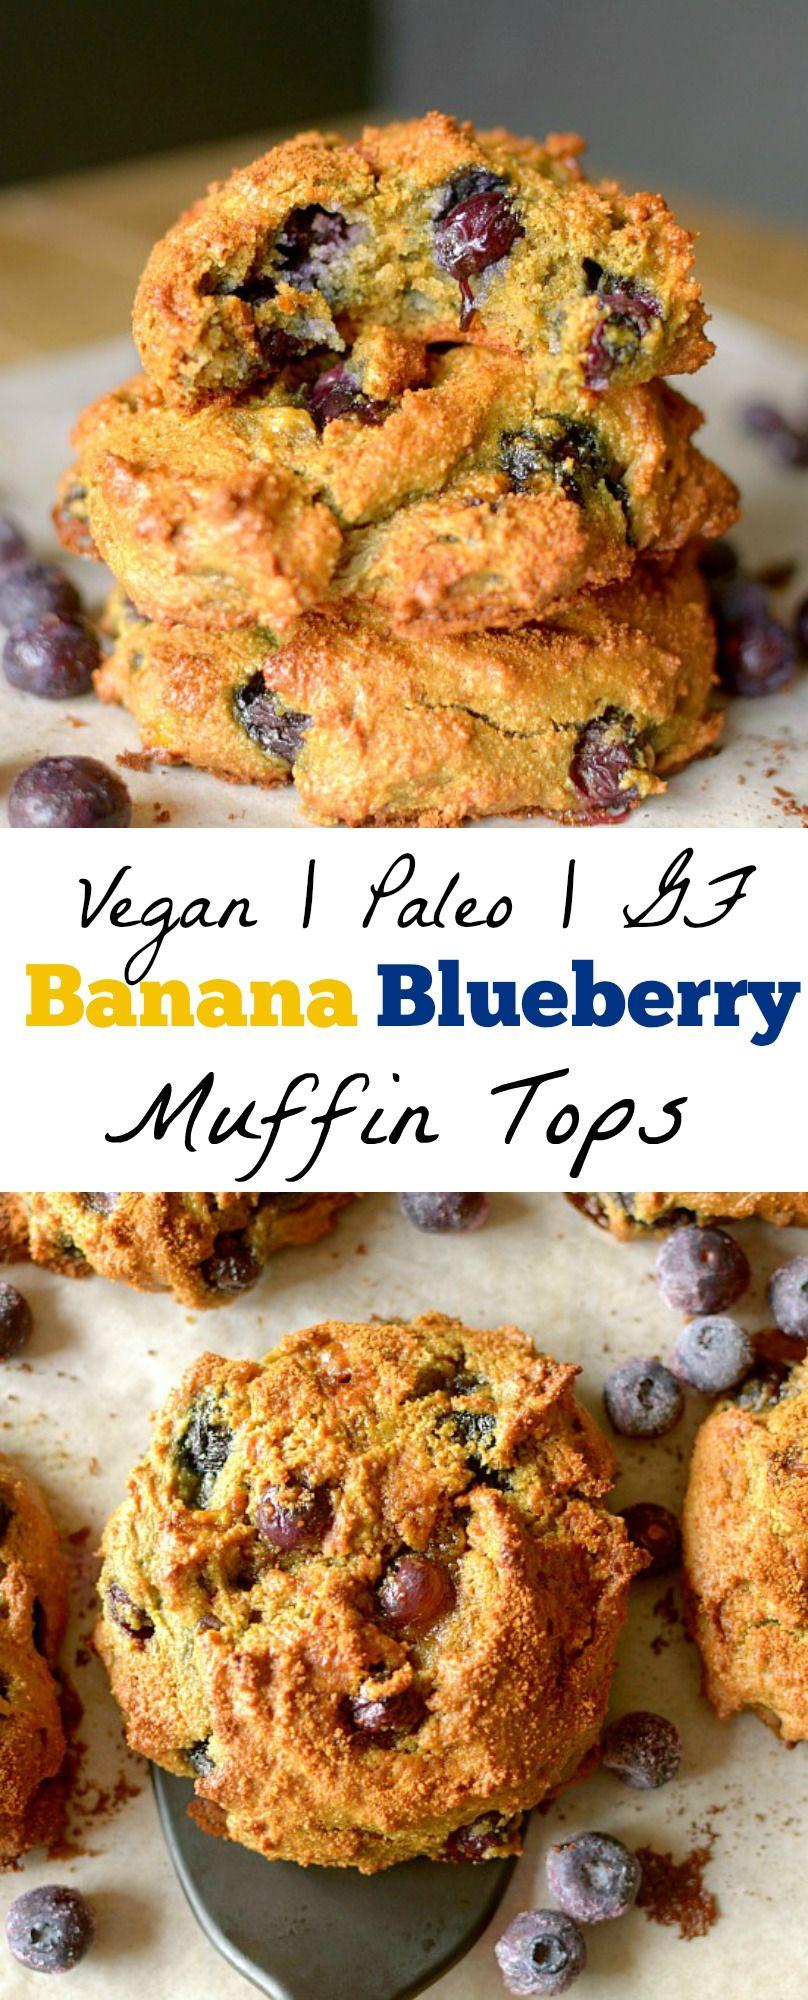 Healthy Banana Blueberry Muffin Tops Paleo Vegan Gluten Free